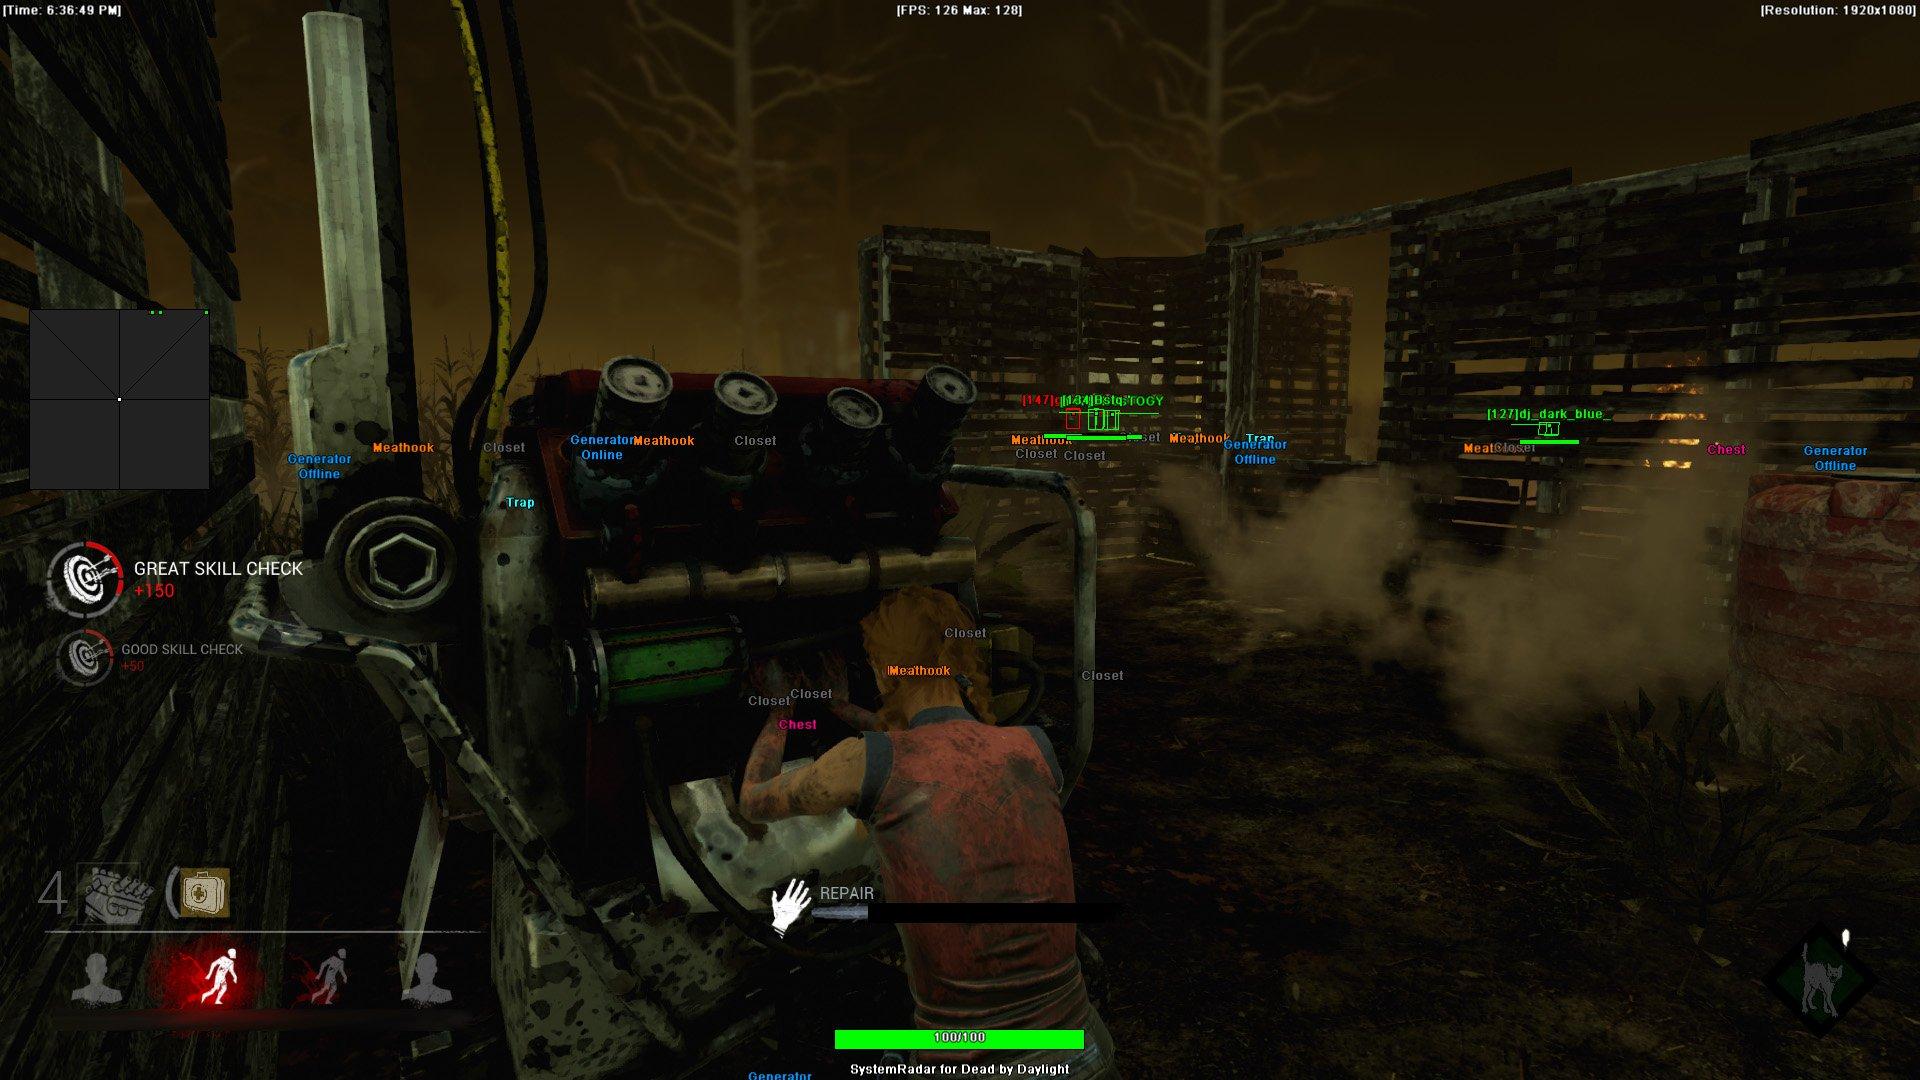 Dead by Daylight Cheat/Hack - SystemCheats